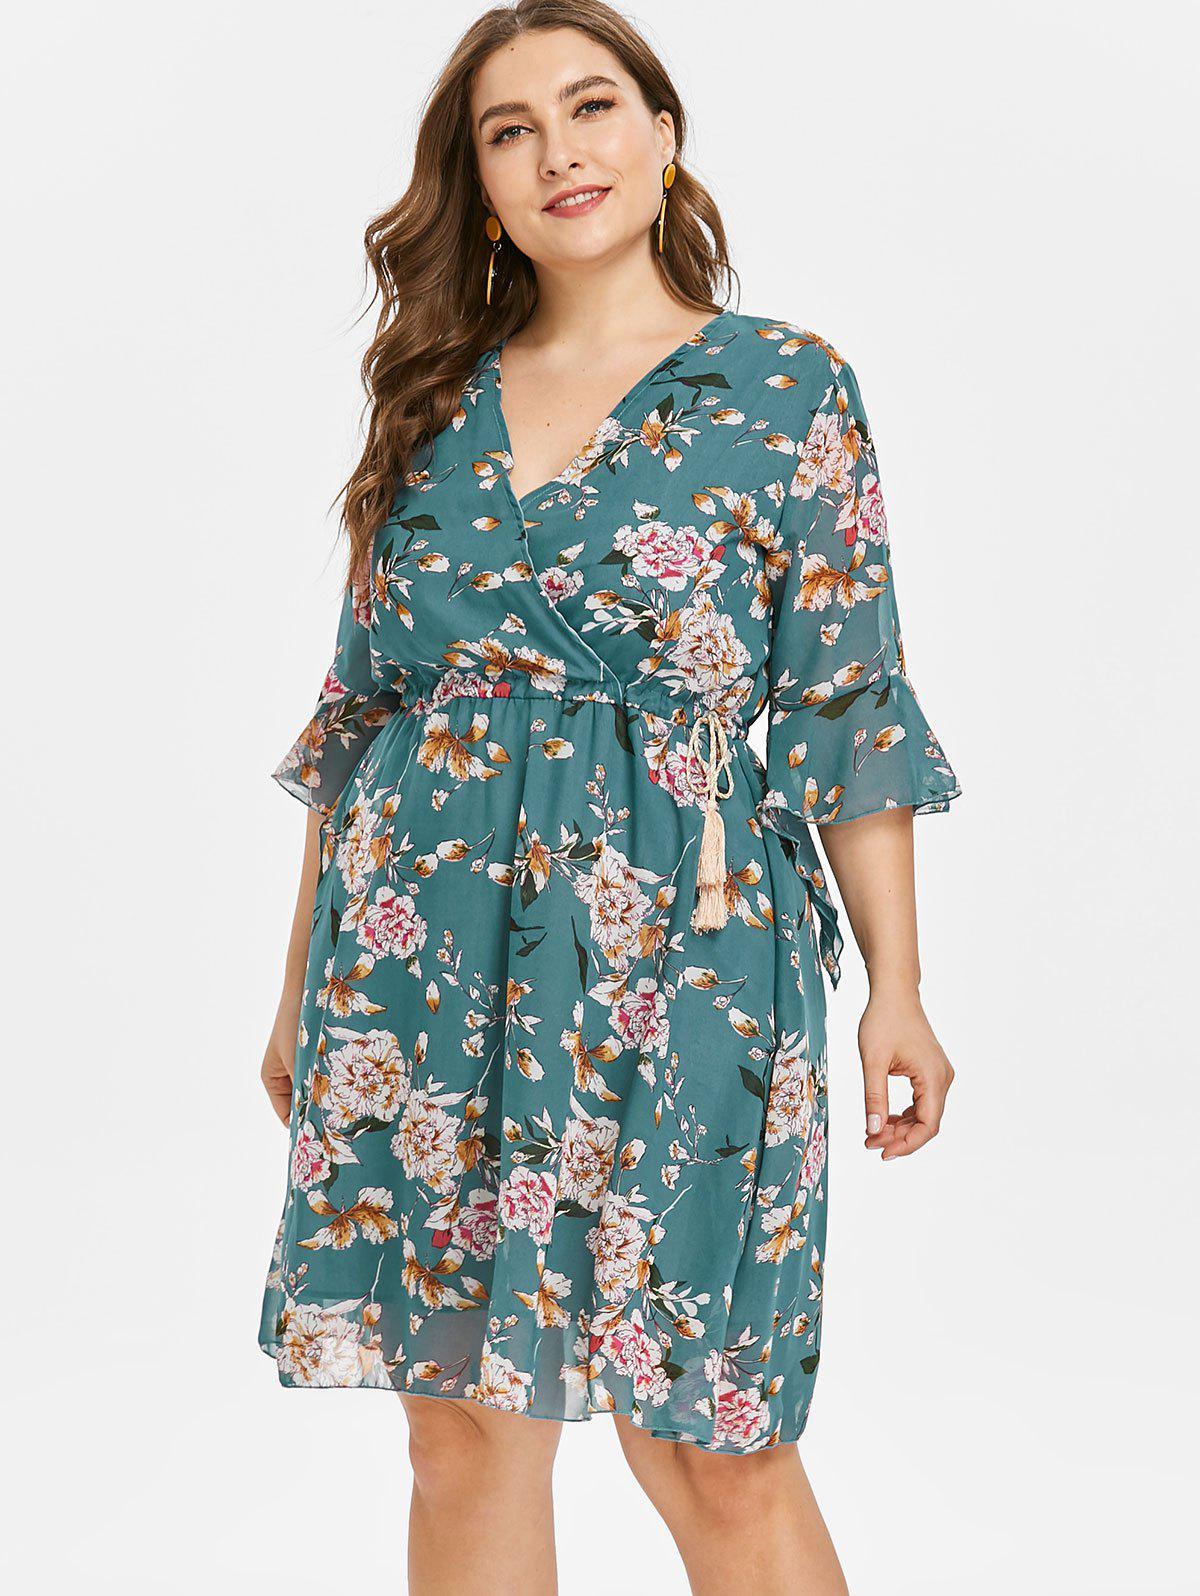 Floral Ruffle Plus Size Skater Dress